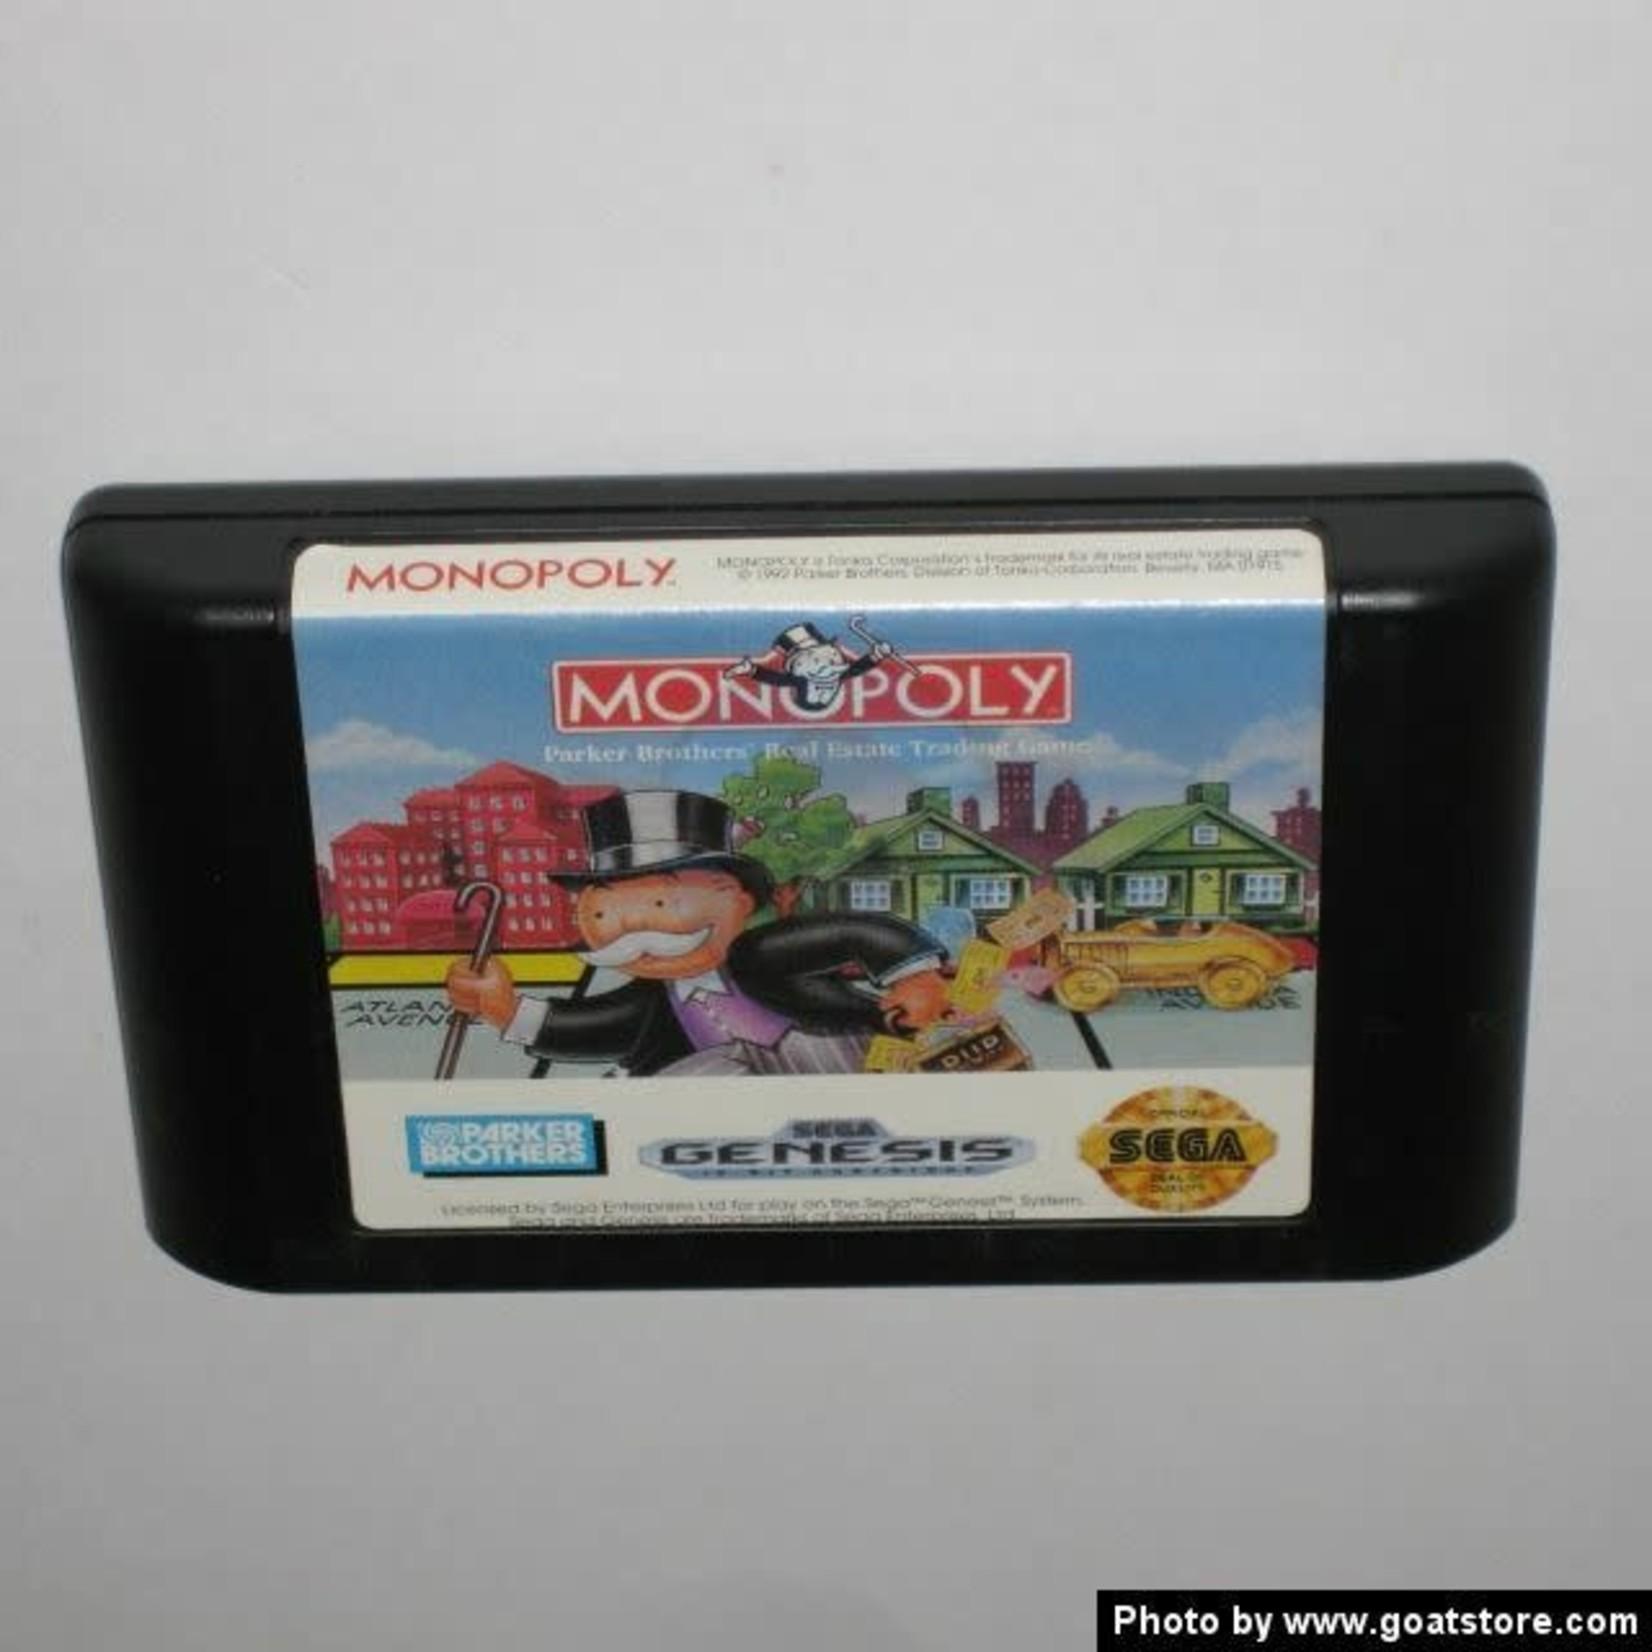 sgu-Monopoly (cartridge)